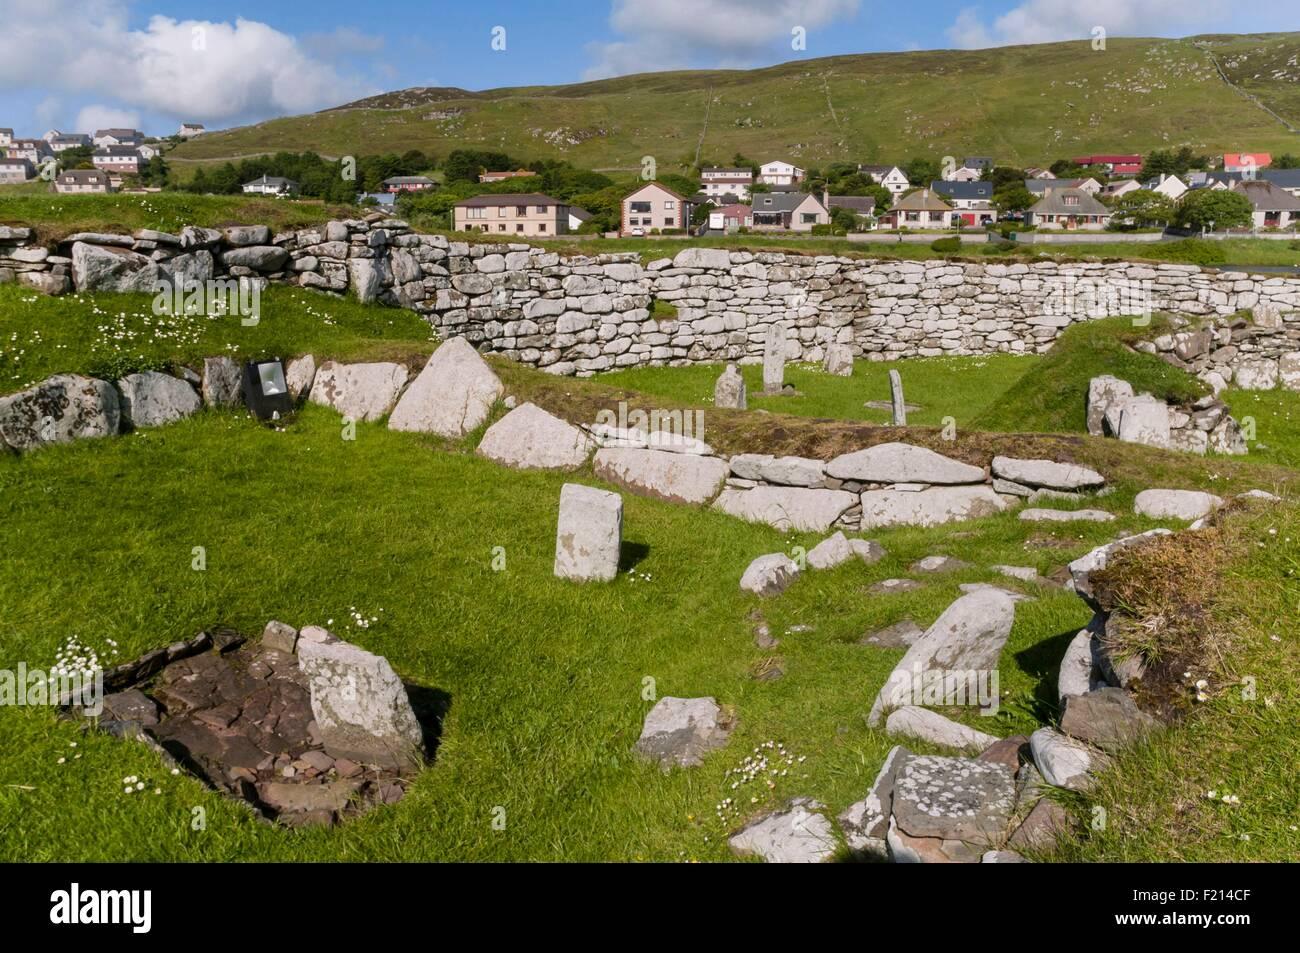 United Kingdom, Scotland, Shetland islands, Lerwick, Clickimin broch - Stock Image